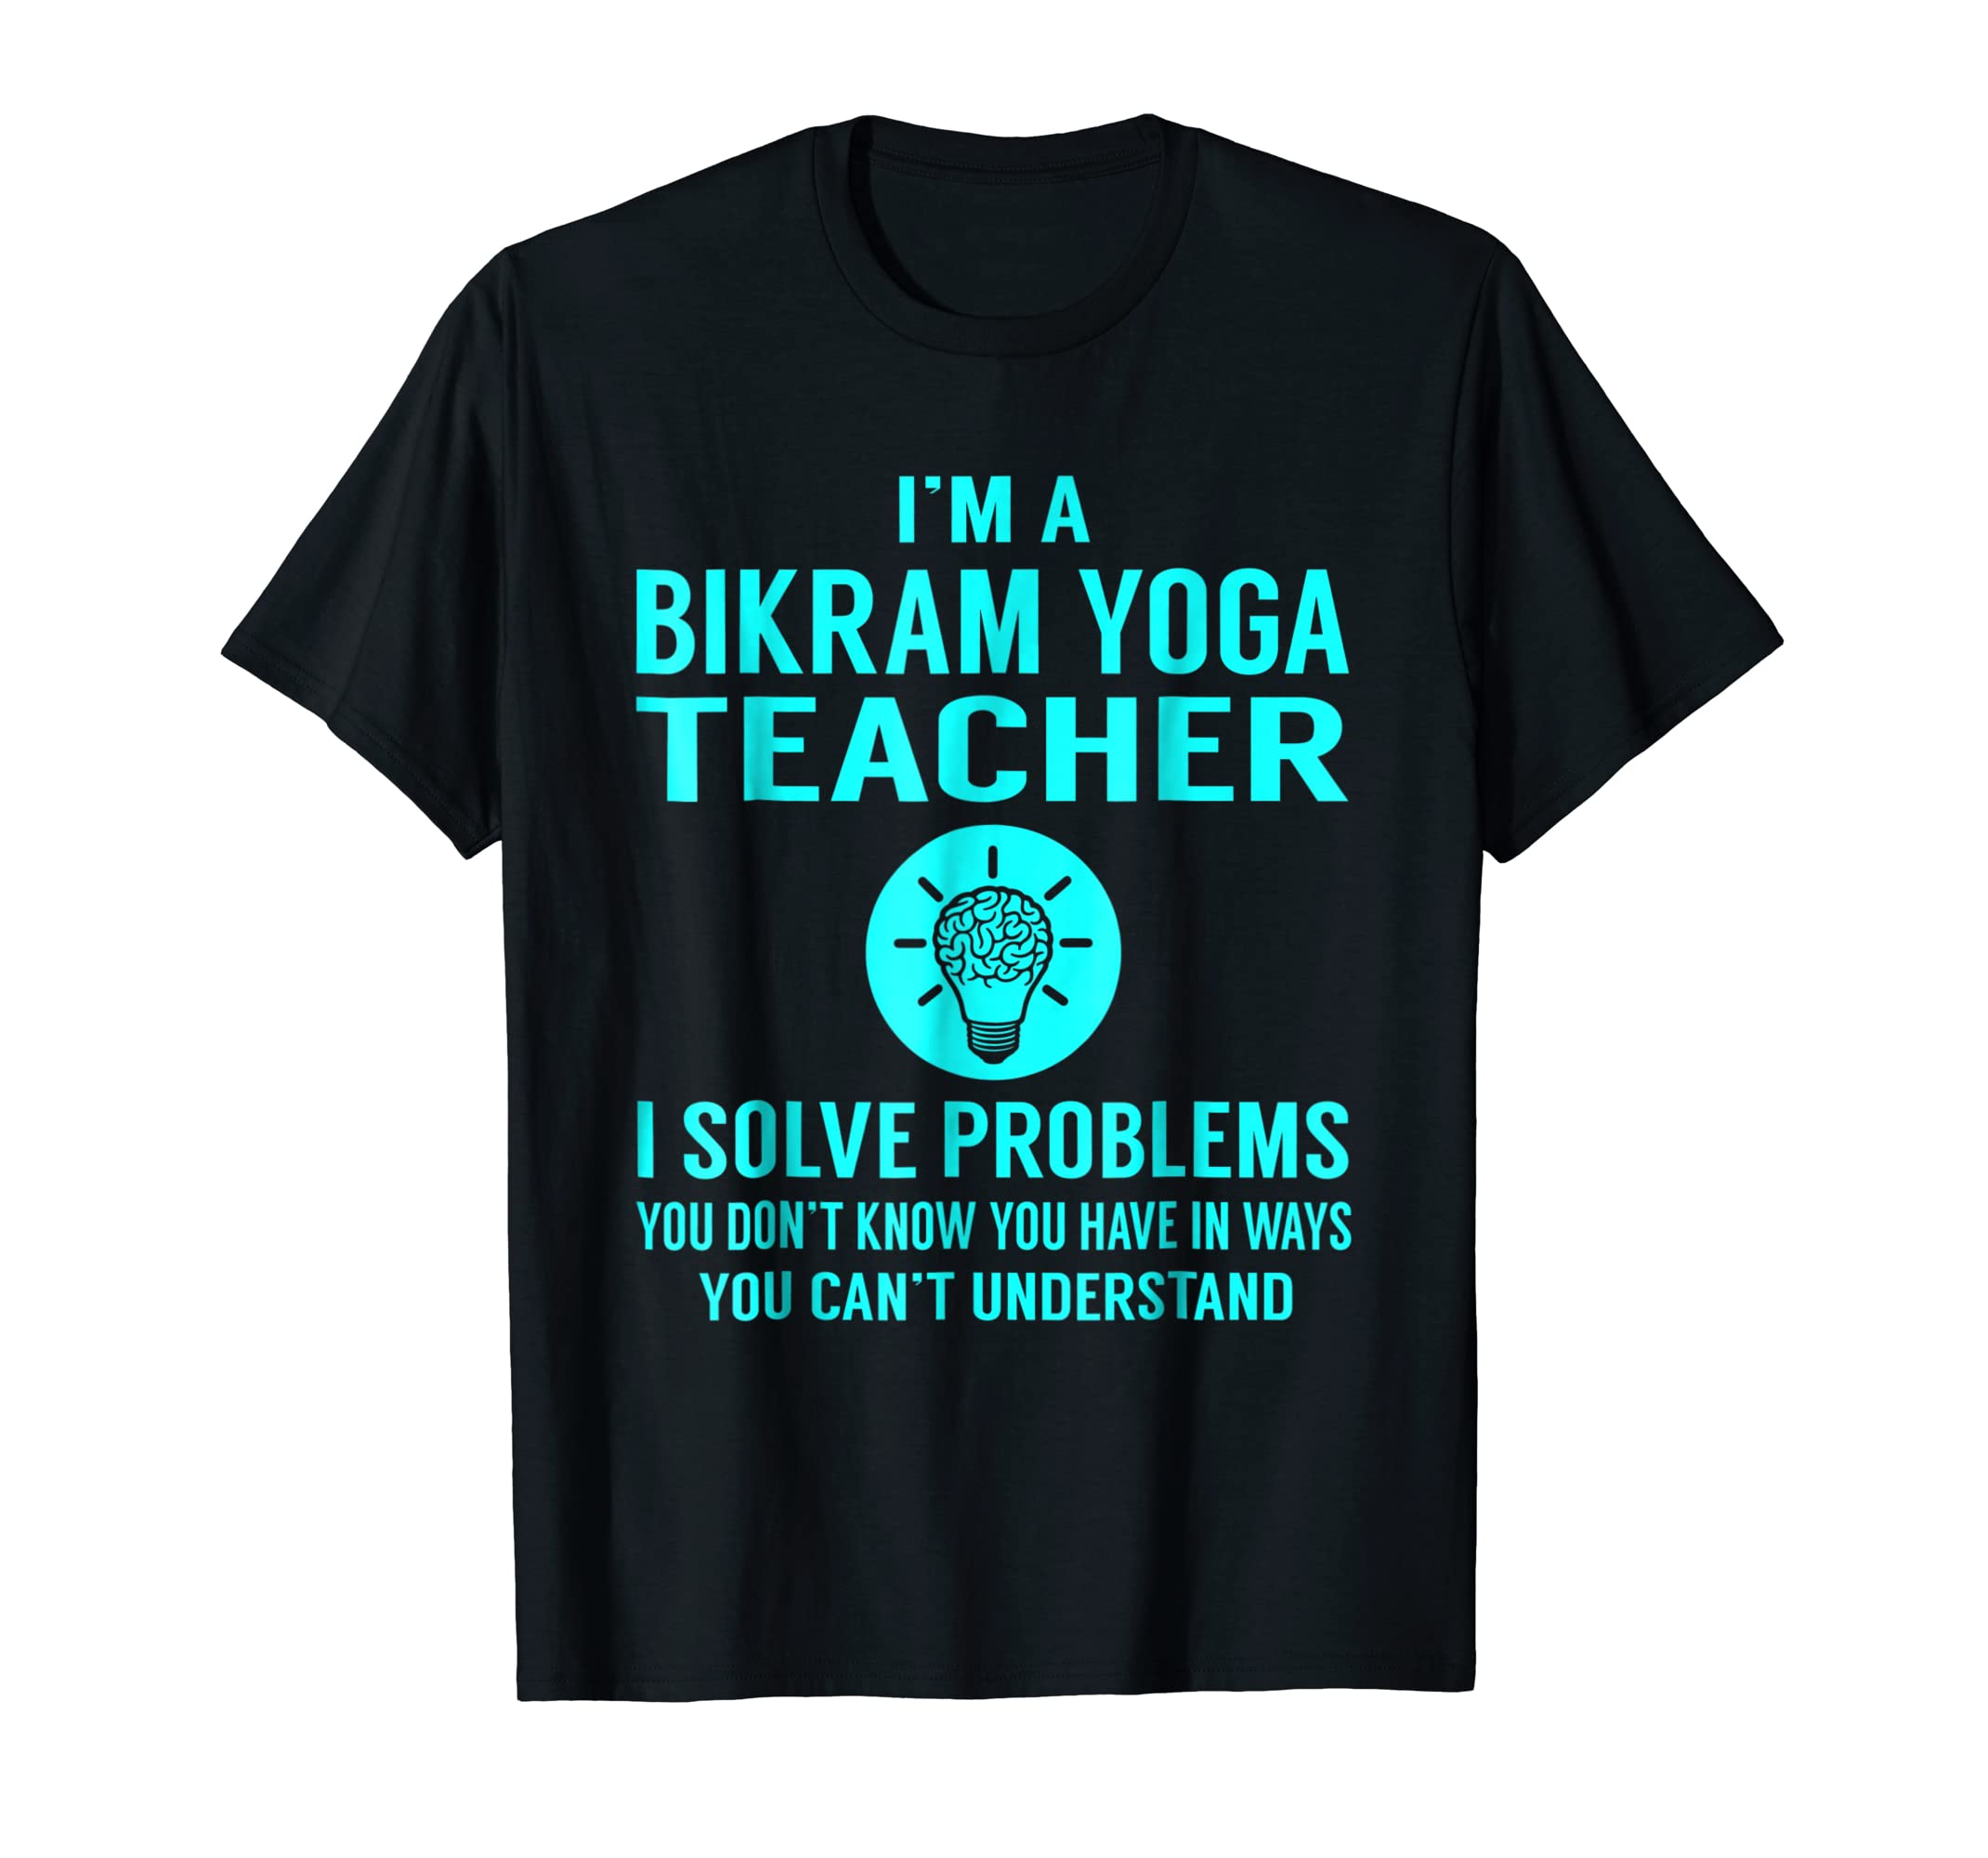 Amazon.com: Bikram Yoga Teacher Solve Problems Job Title ...